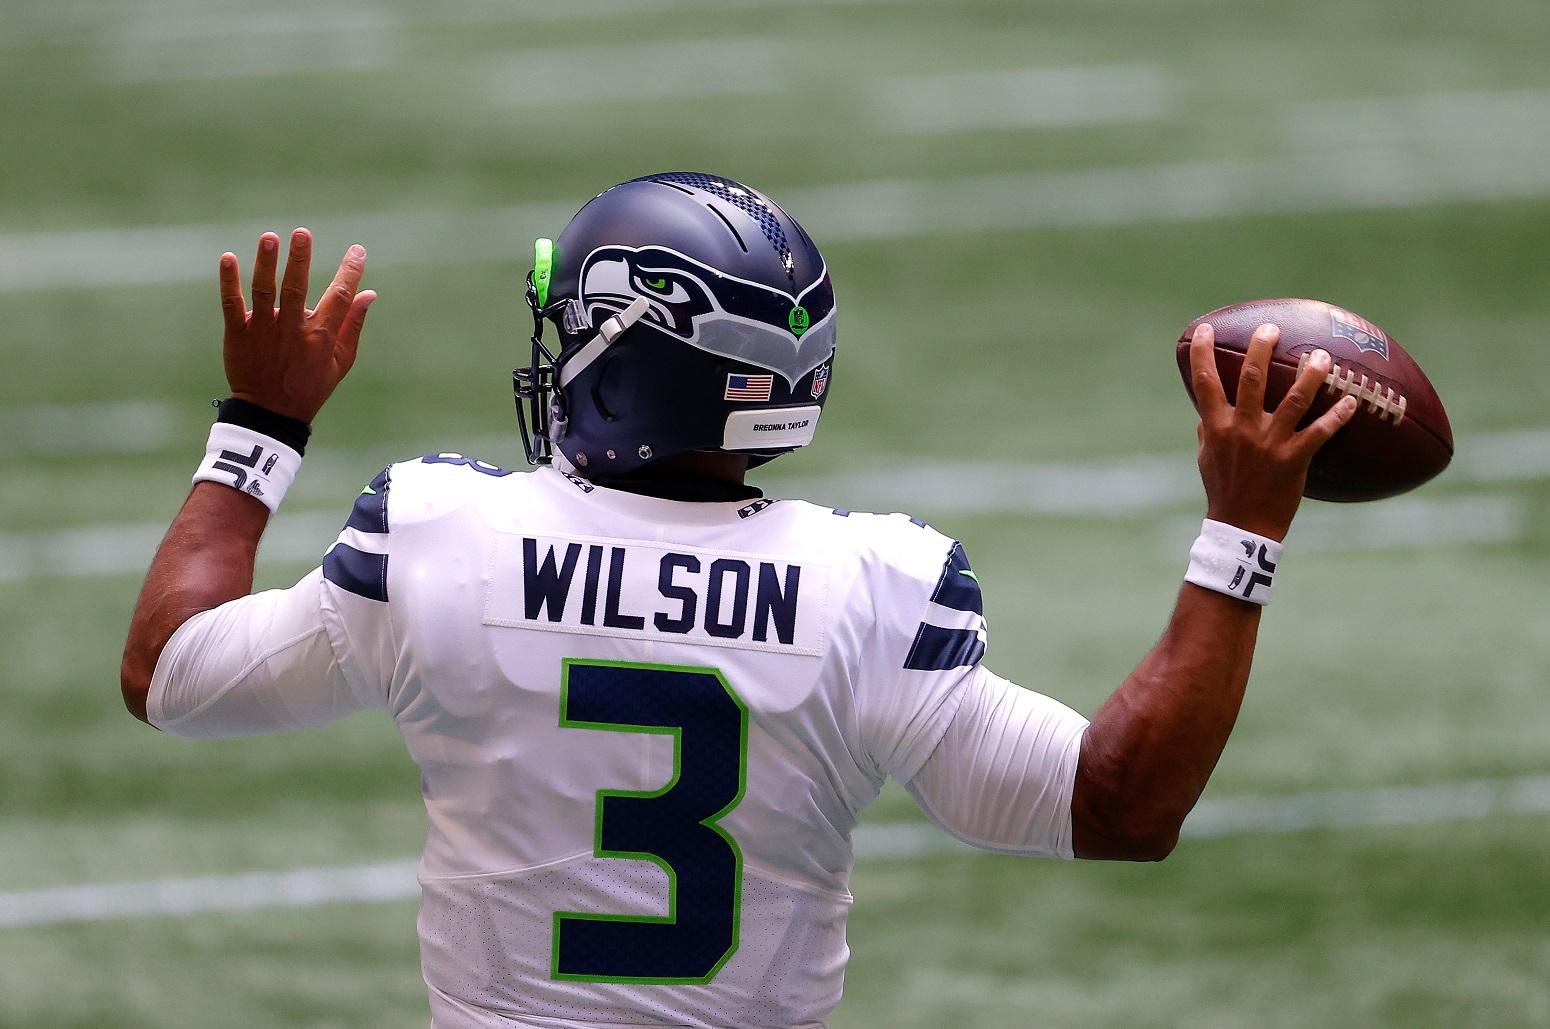 Russell Wilson Seahawks Breonna Taylor helmet